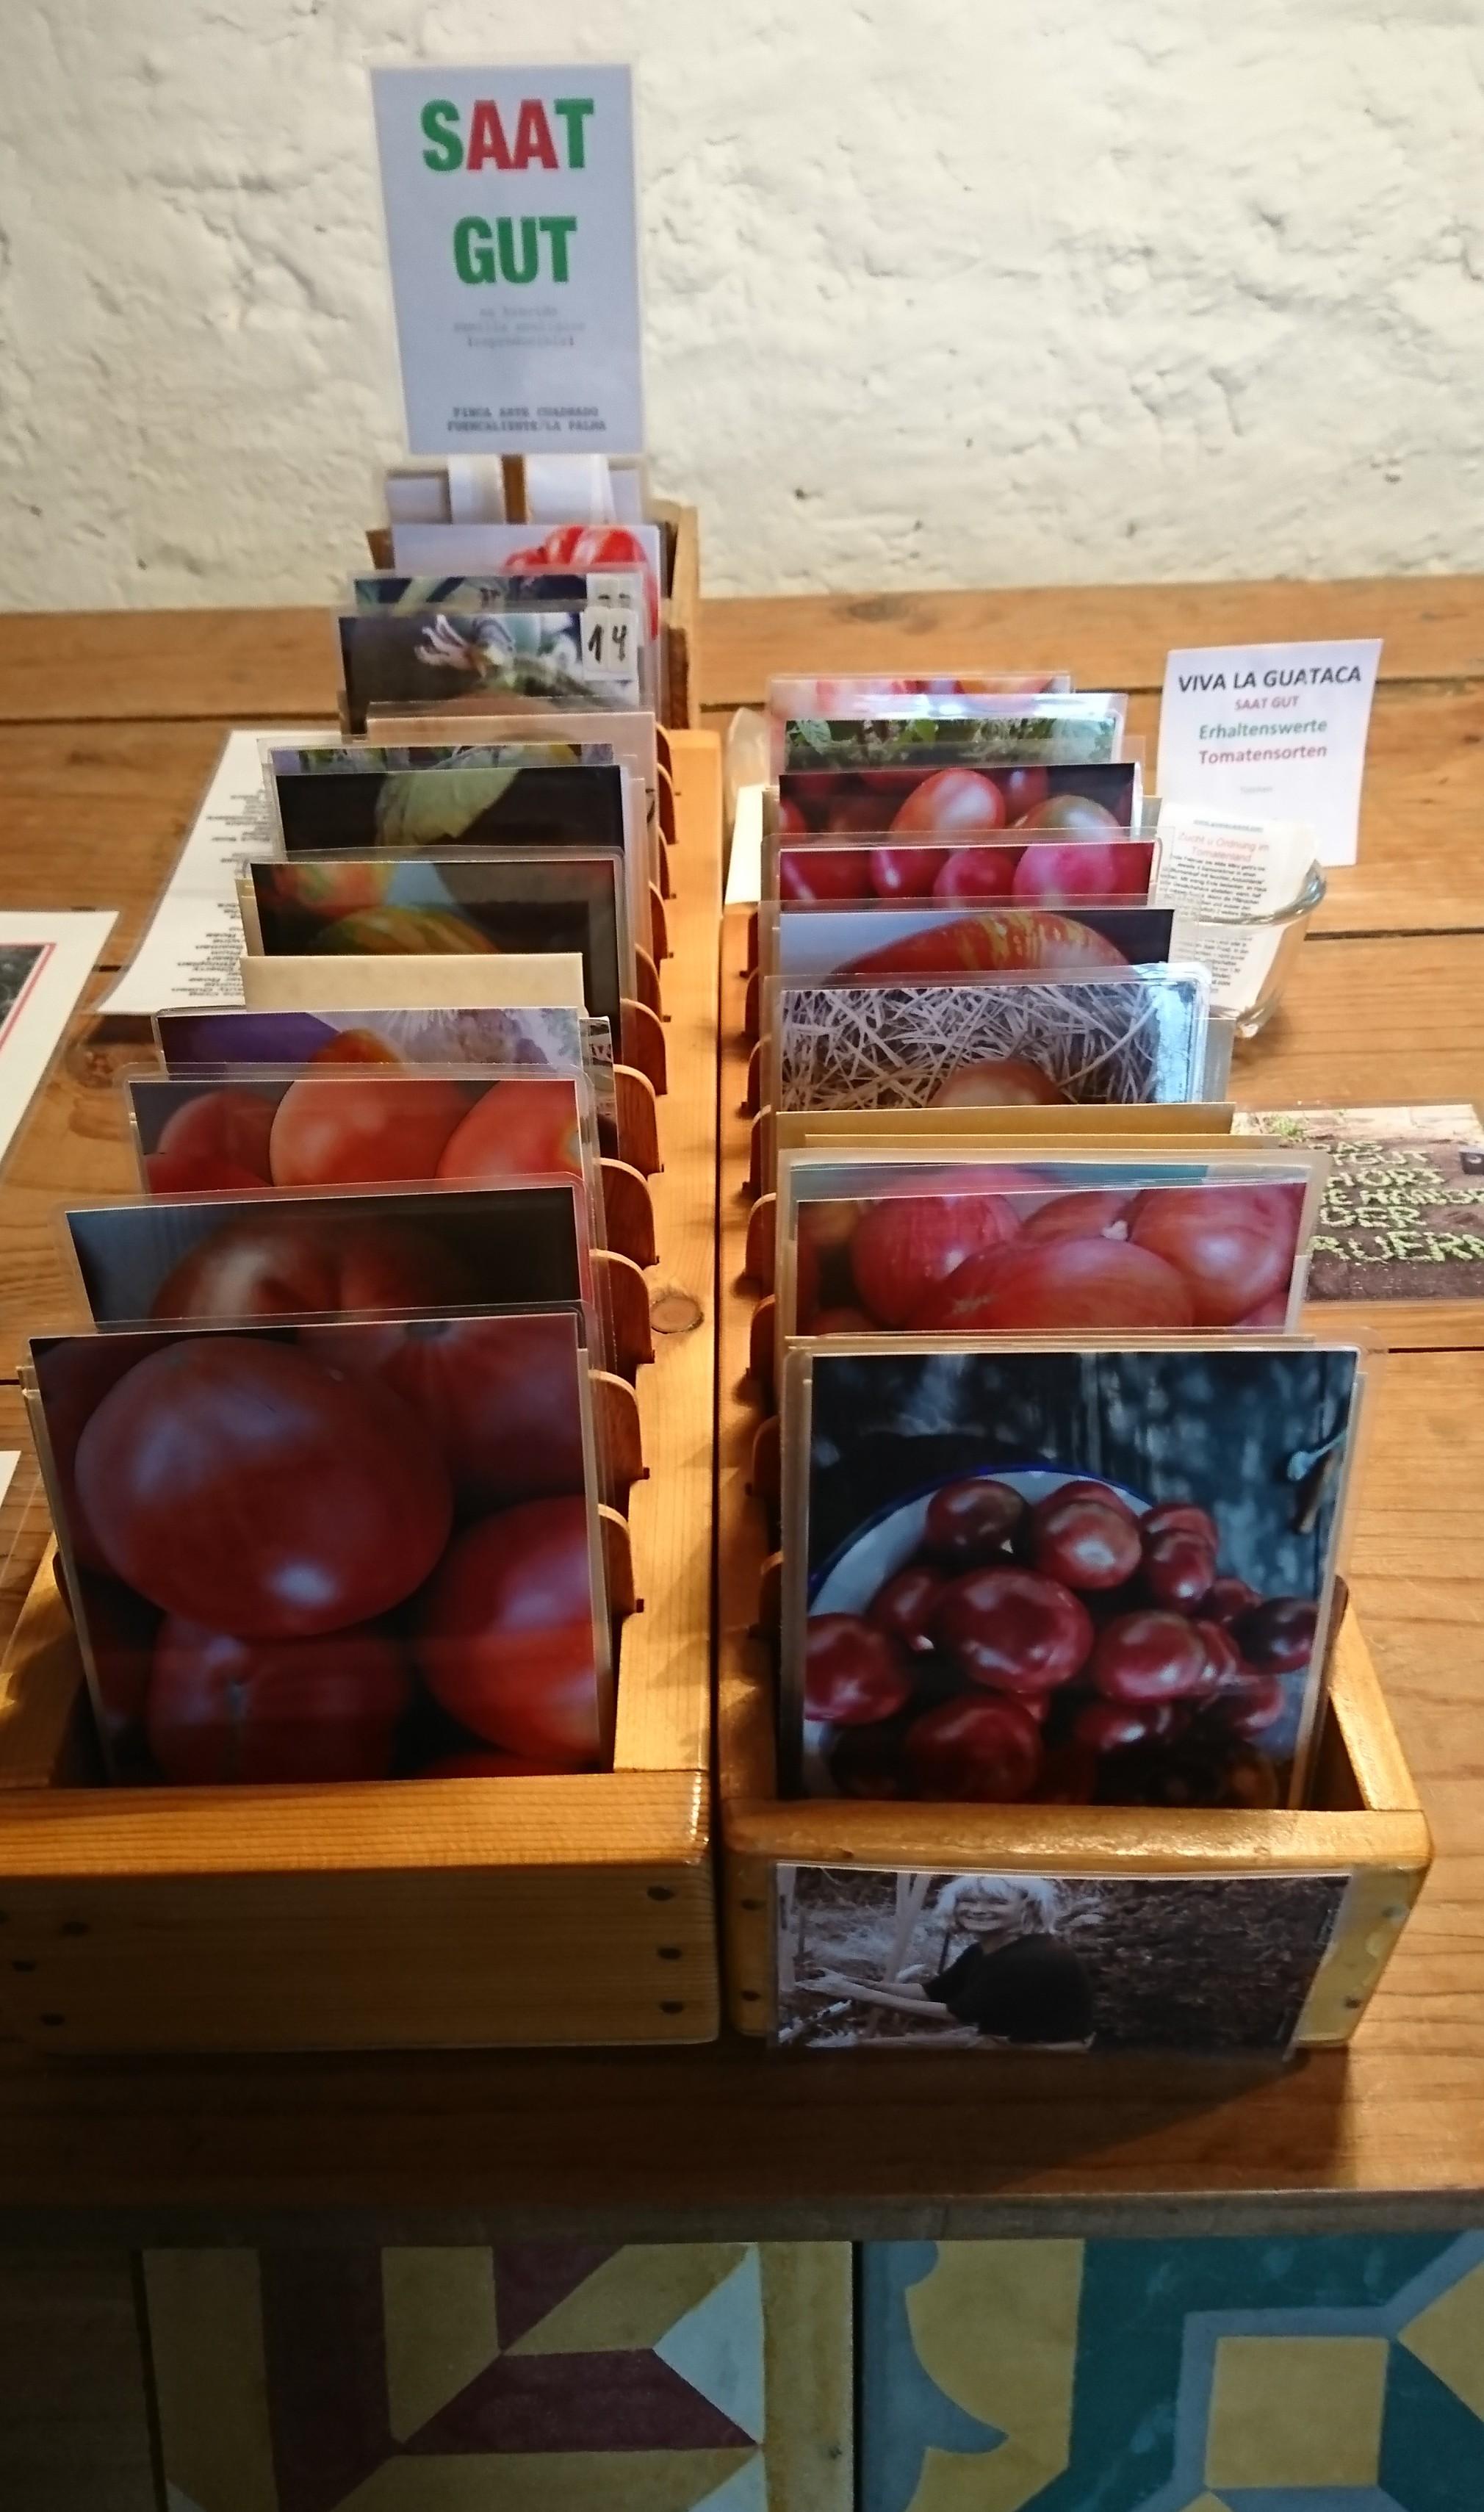 Salz & Tomaten